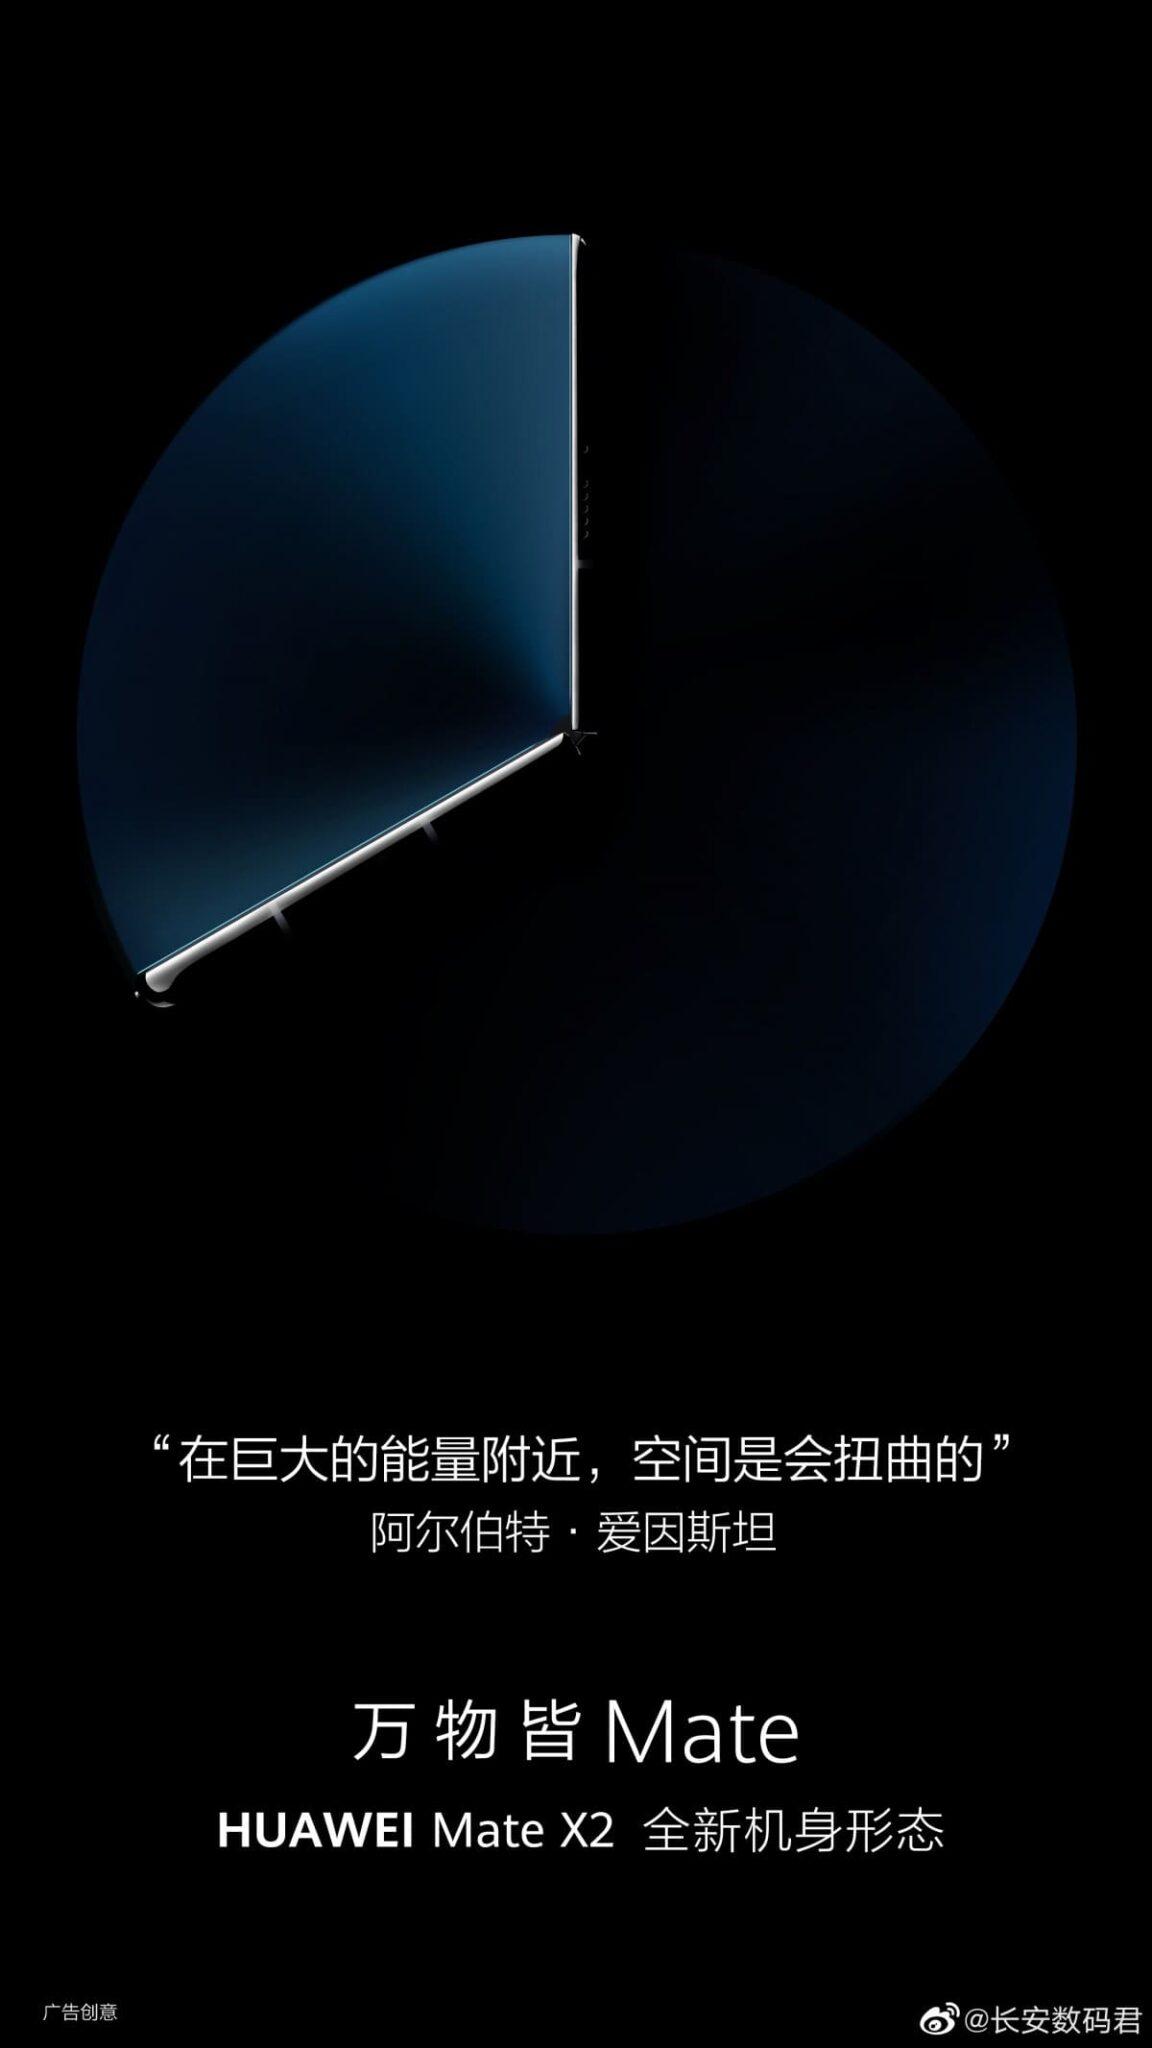 teaser-Huawei-Mate-X2